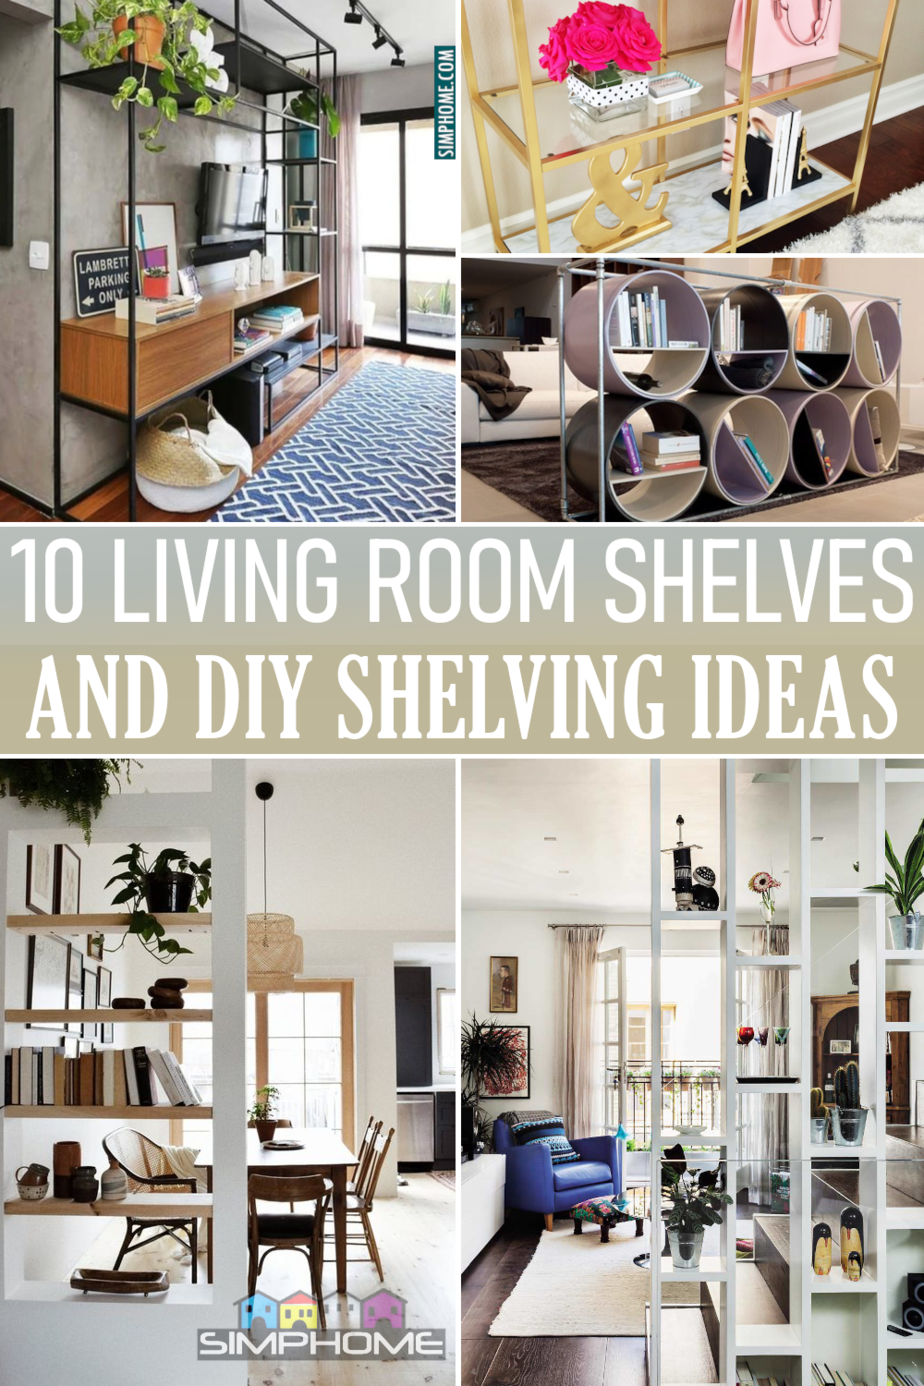 10 Living Room Shelves or Shelving Ideas via Simphome.comFeatured image